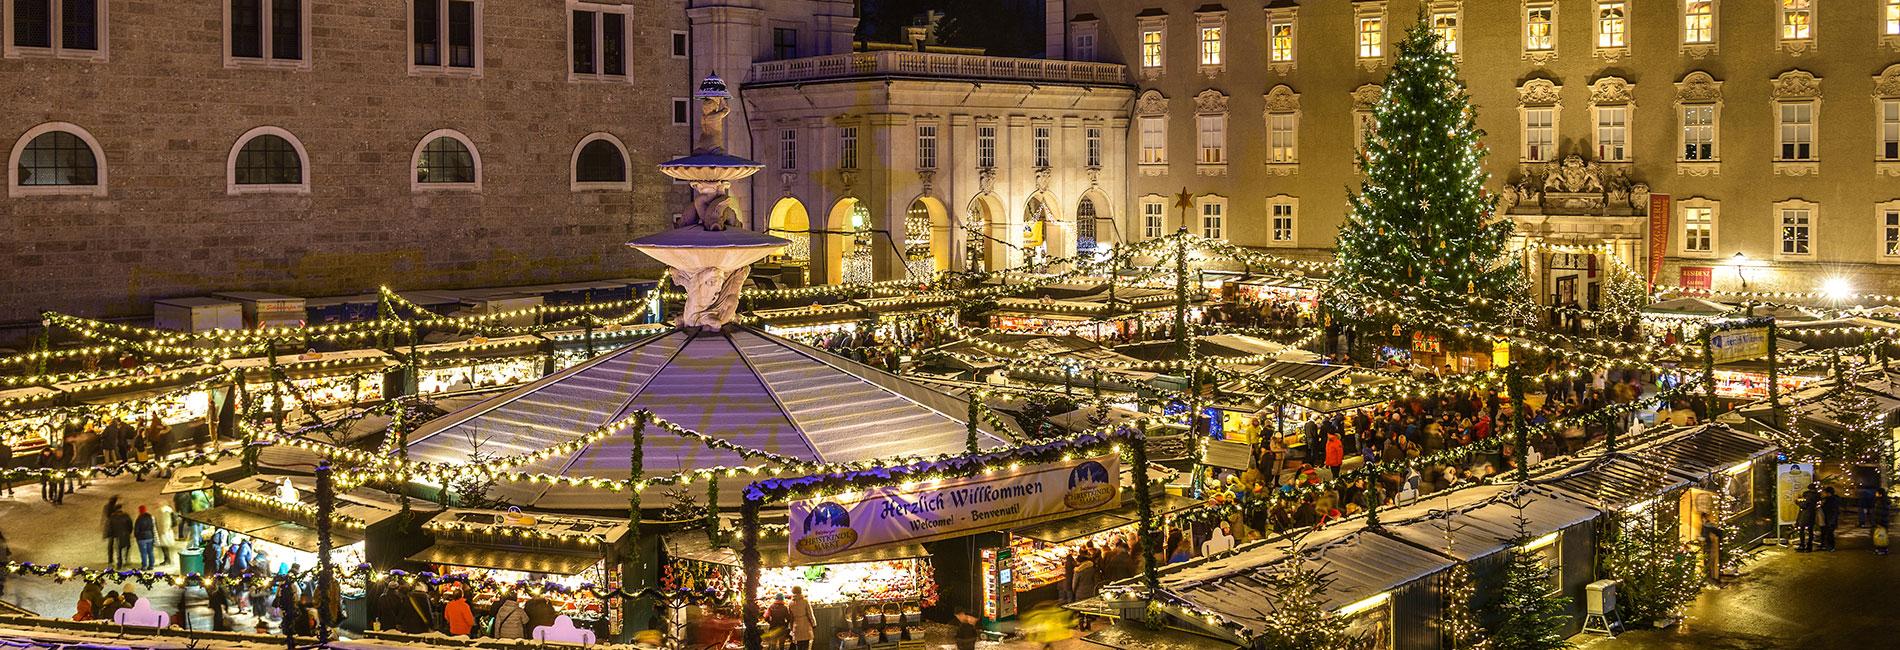 Salzburg Guide Tourismus - Christkindlmarkt